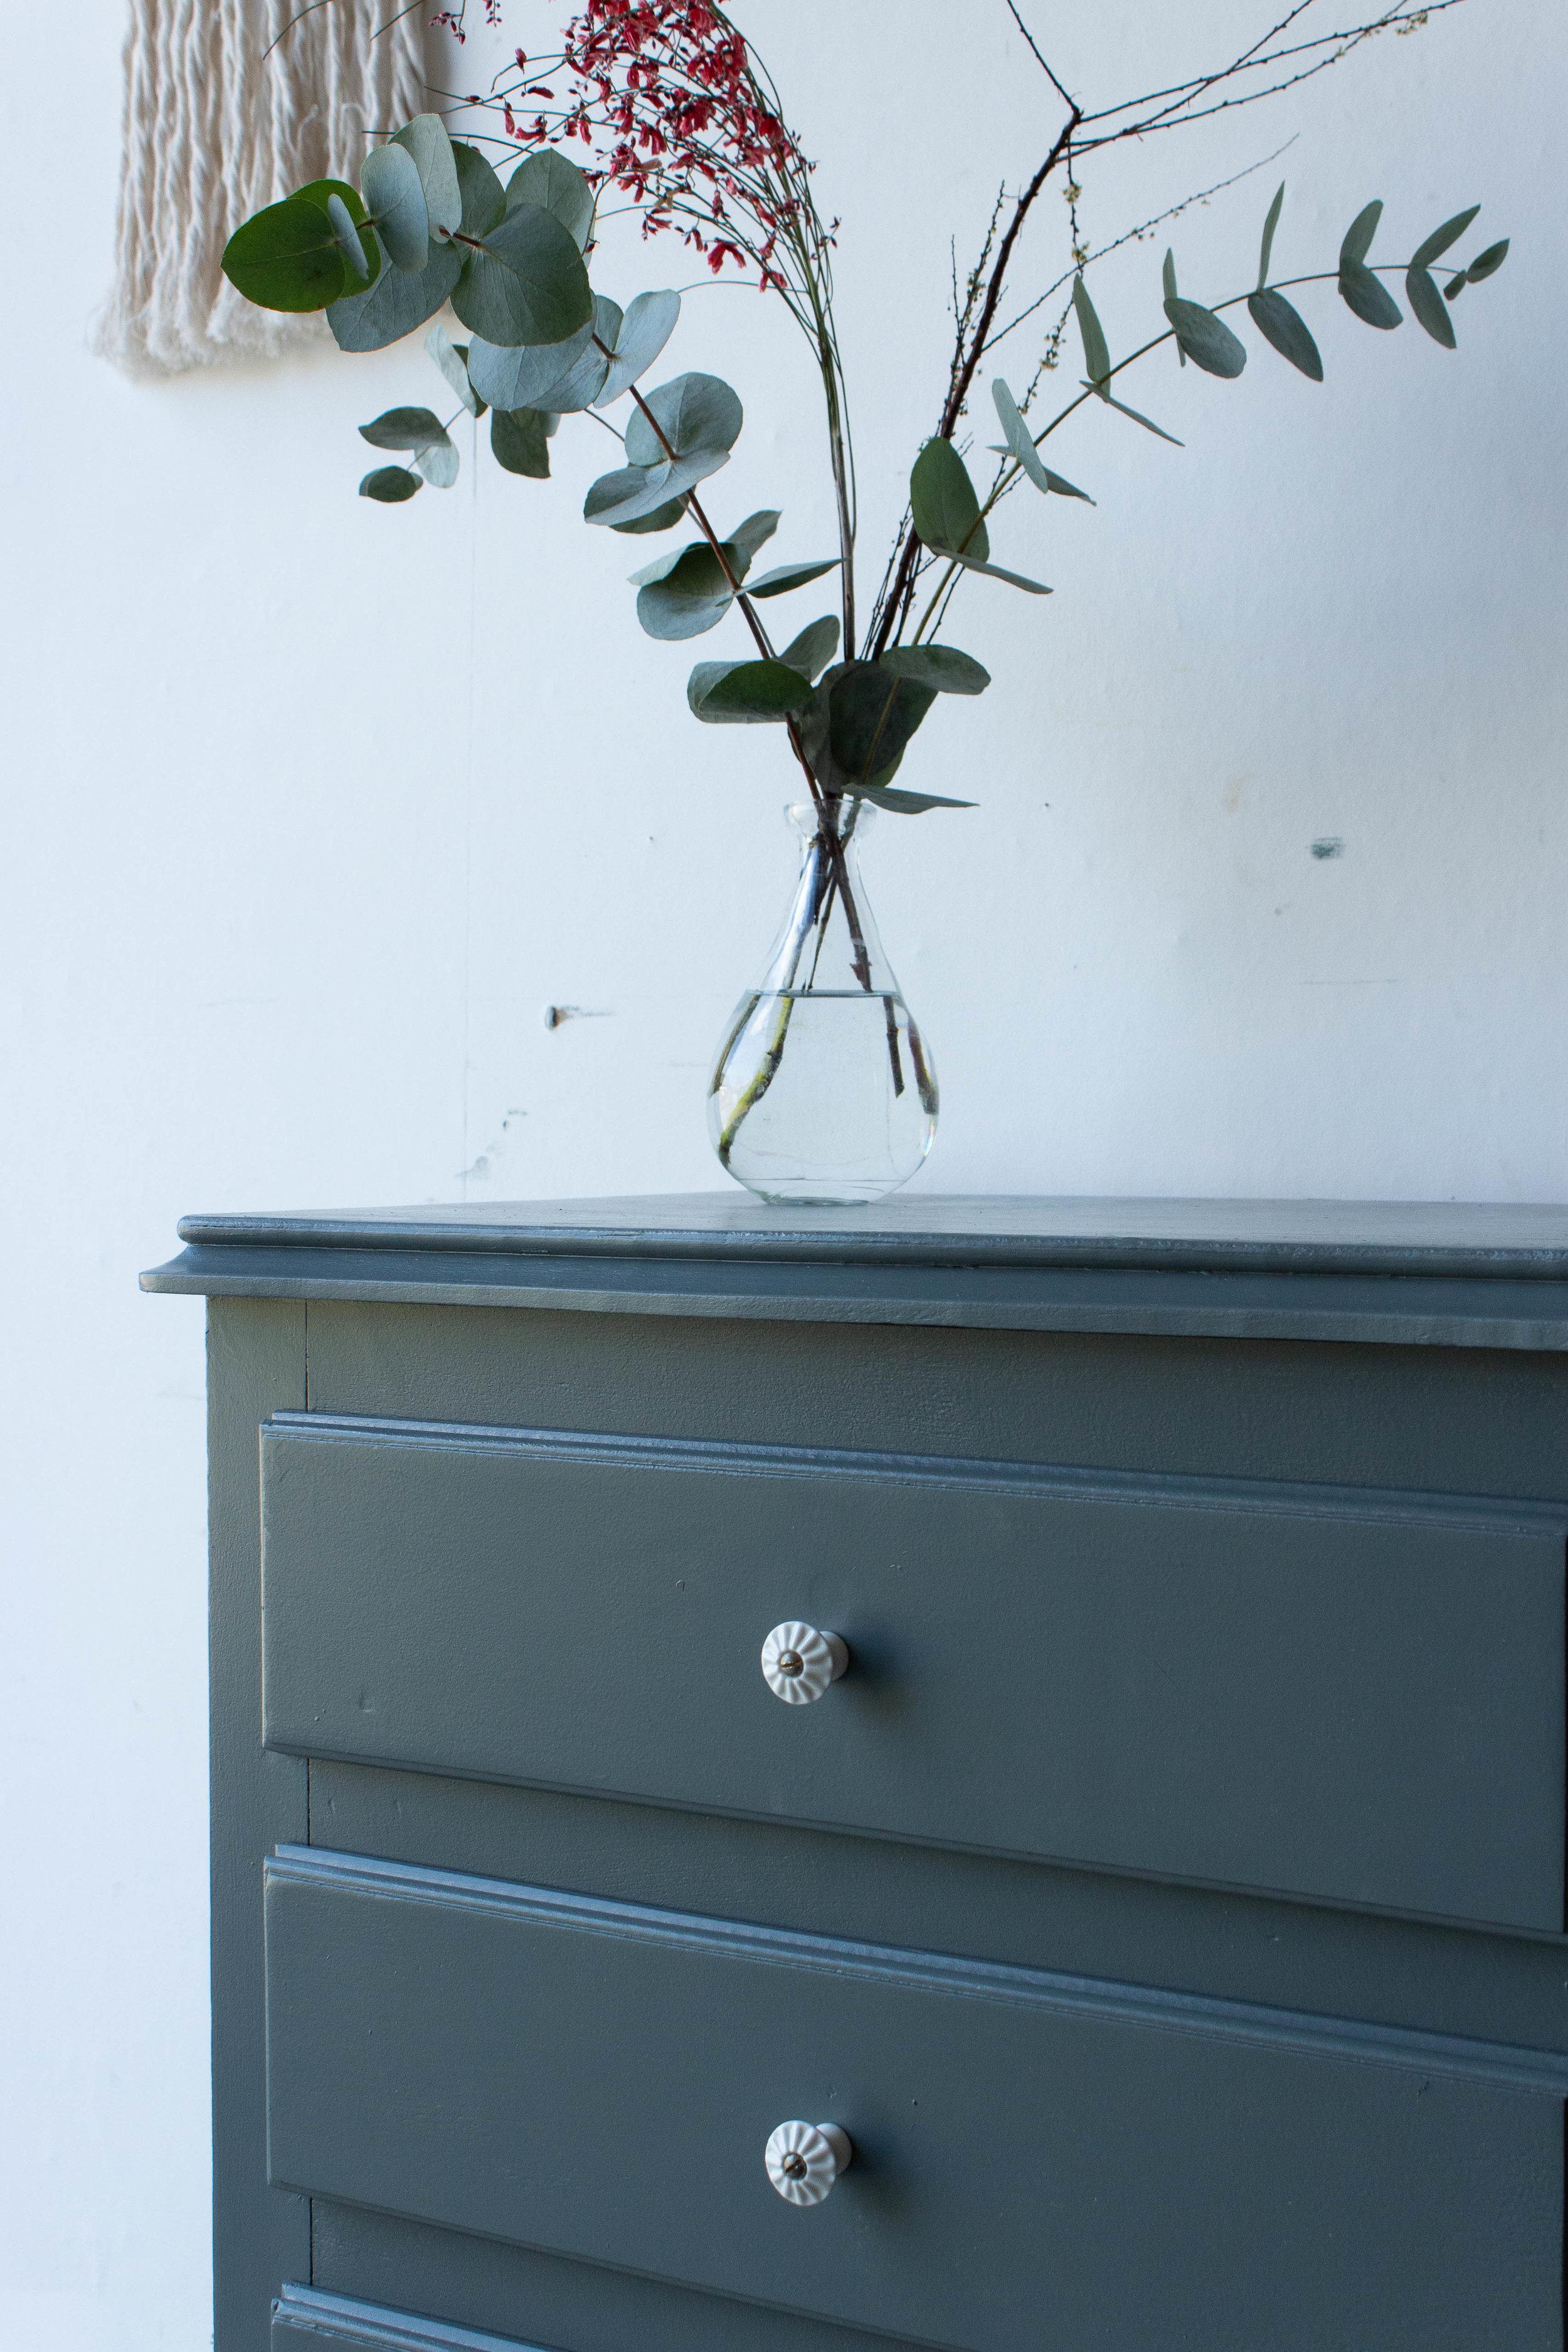 1506 - Vintage ladenkastje in antraciet kleur-4.jpg